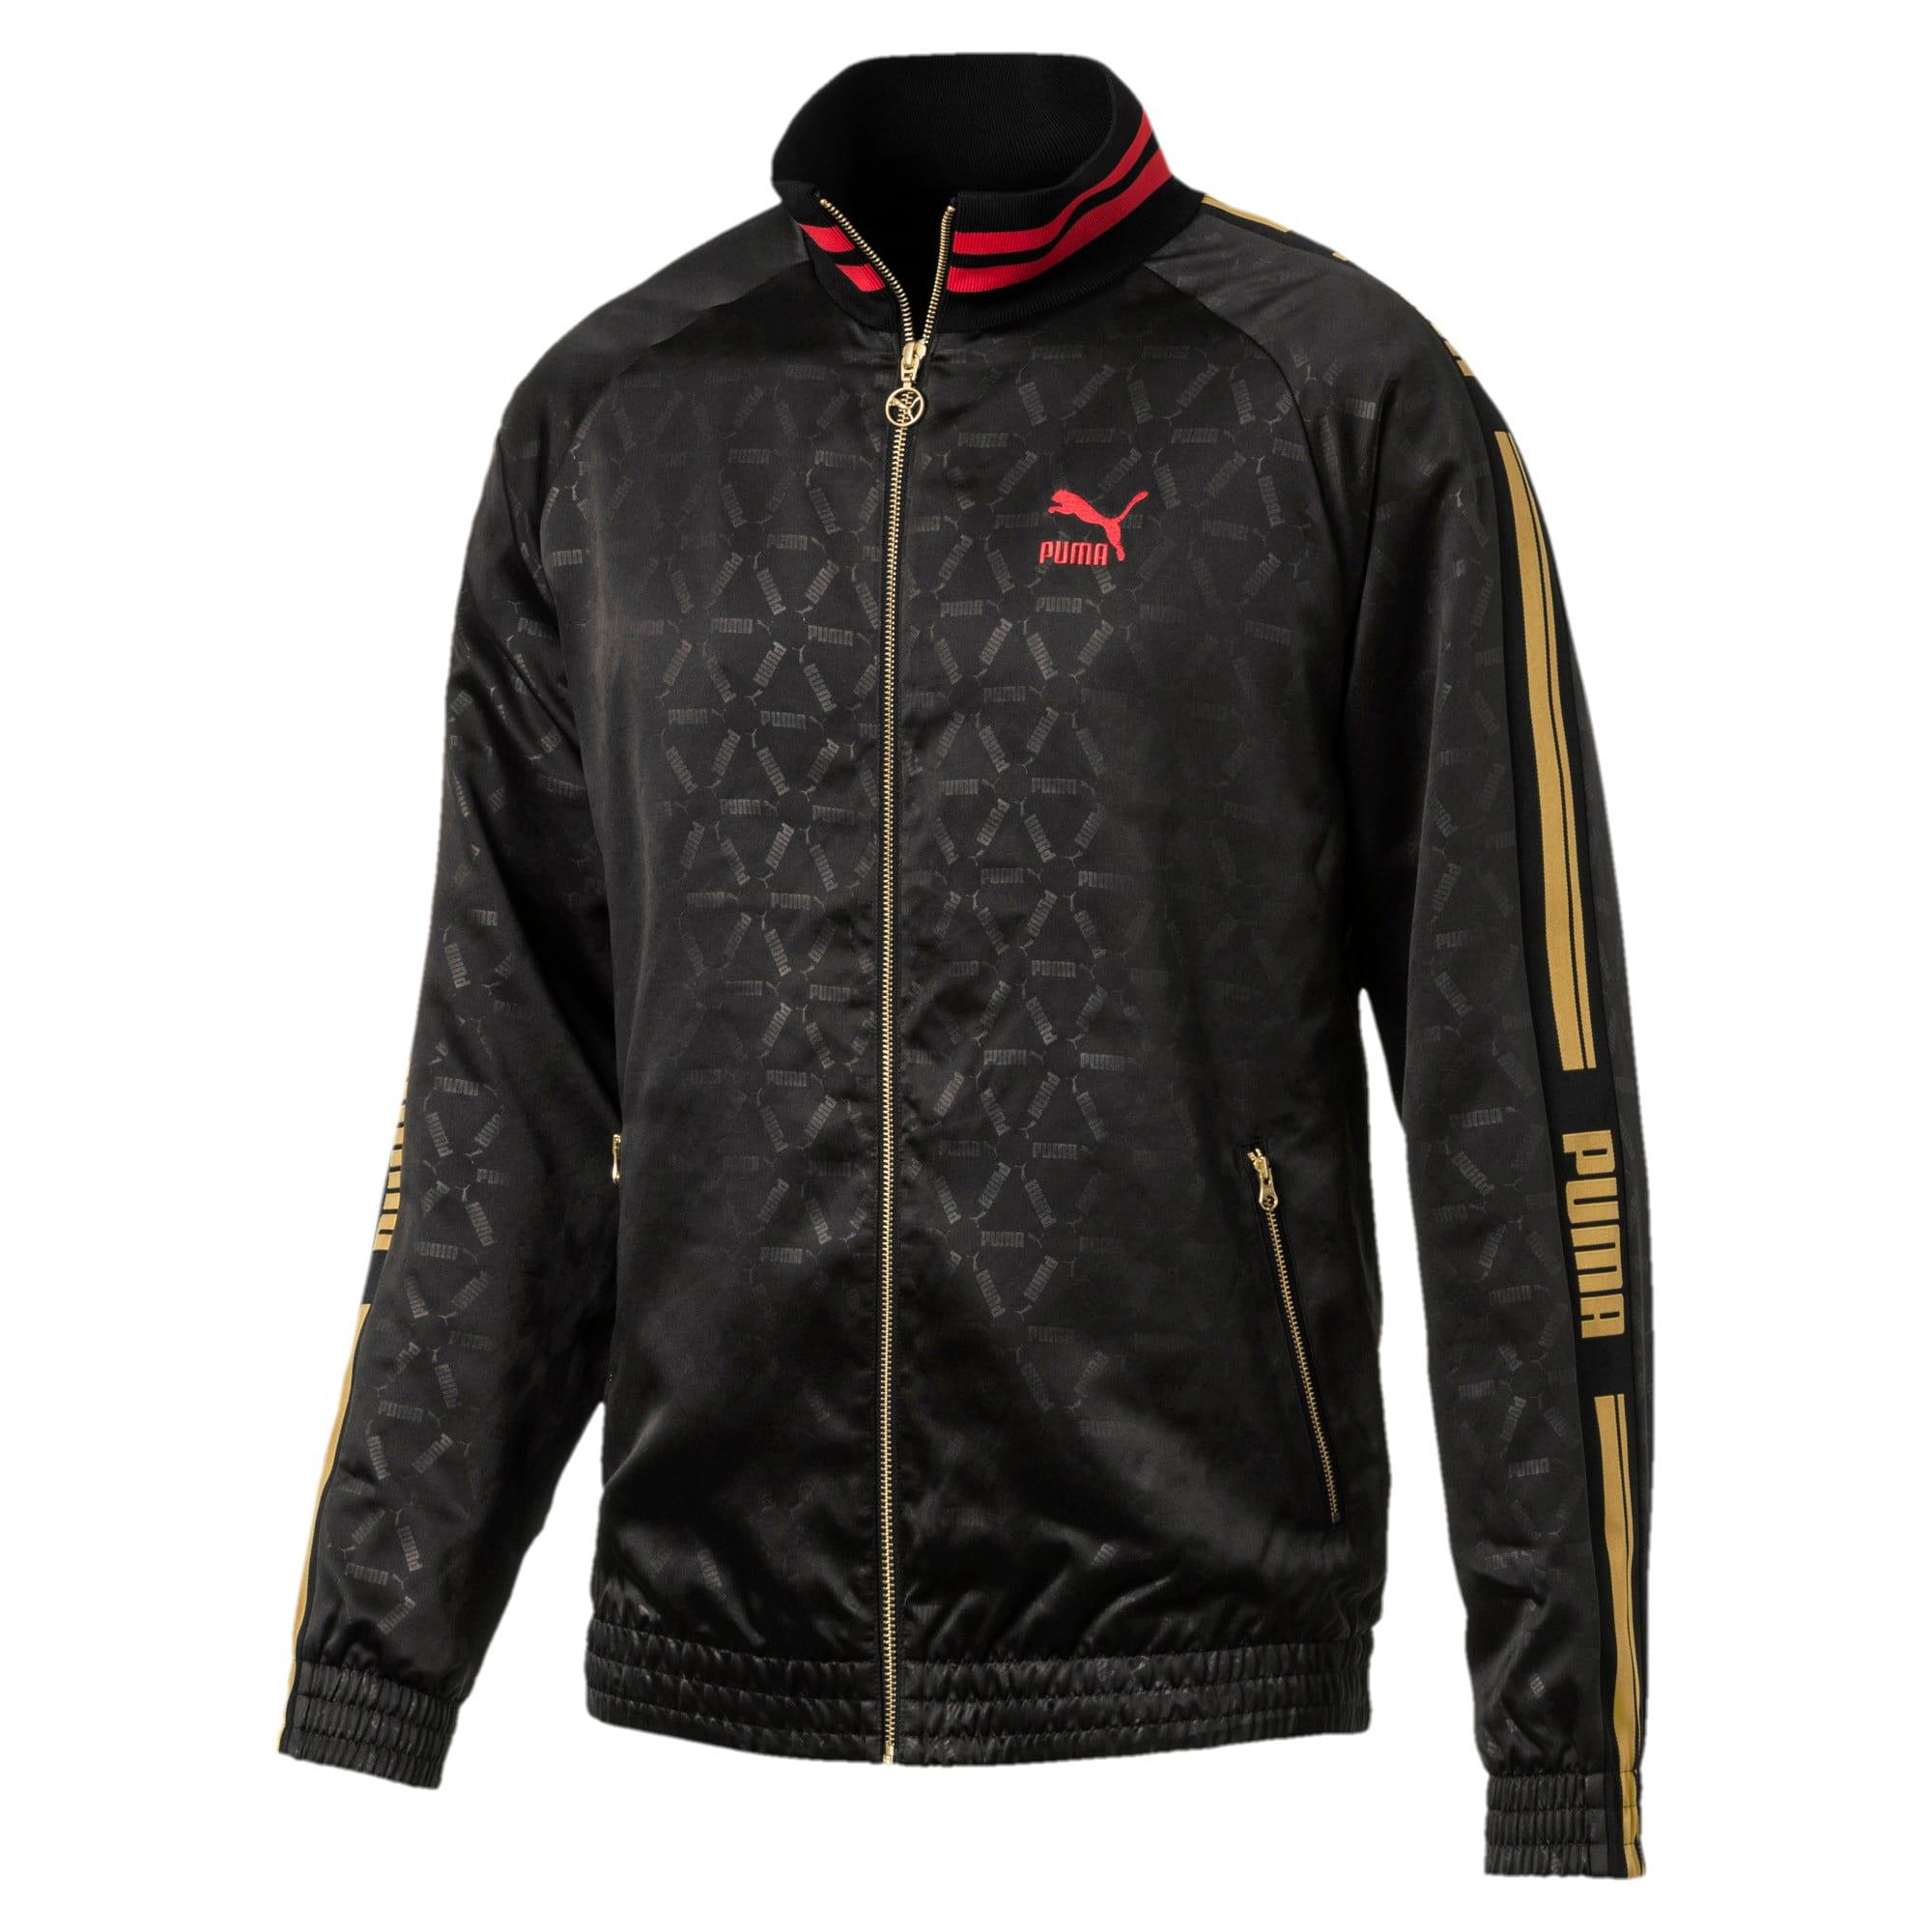 Thumbnail 1 of LUXE PACK Track Jacket, Puma Black-AOP, medium